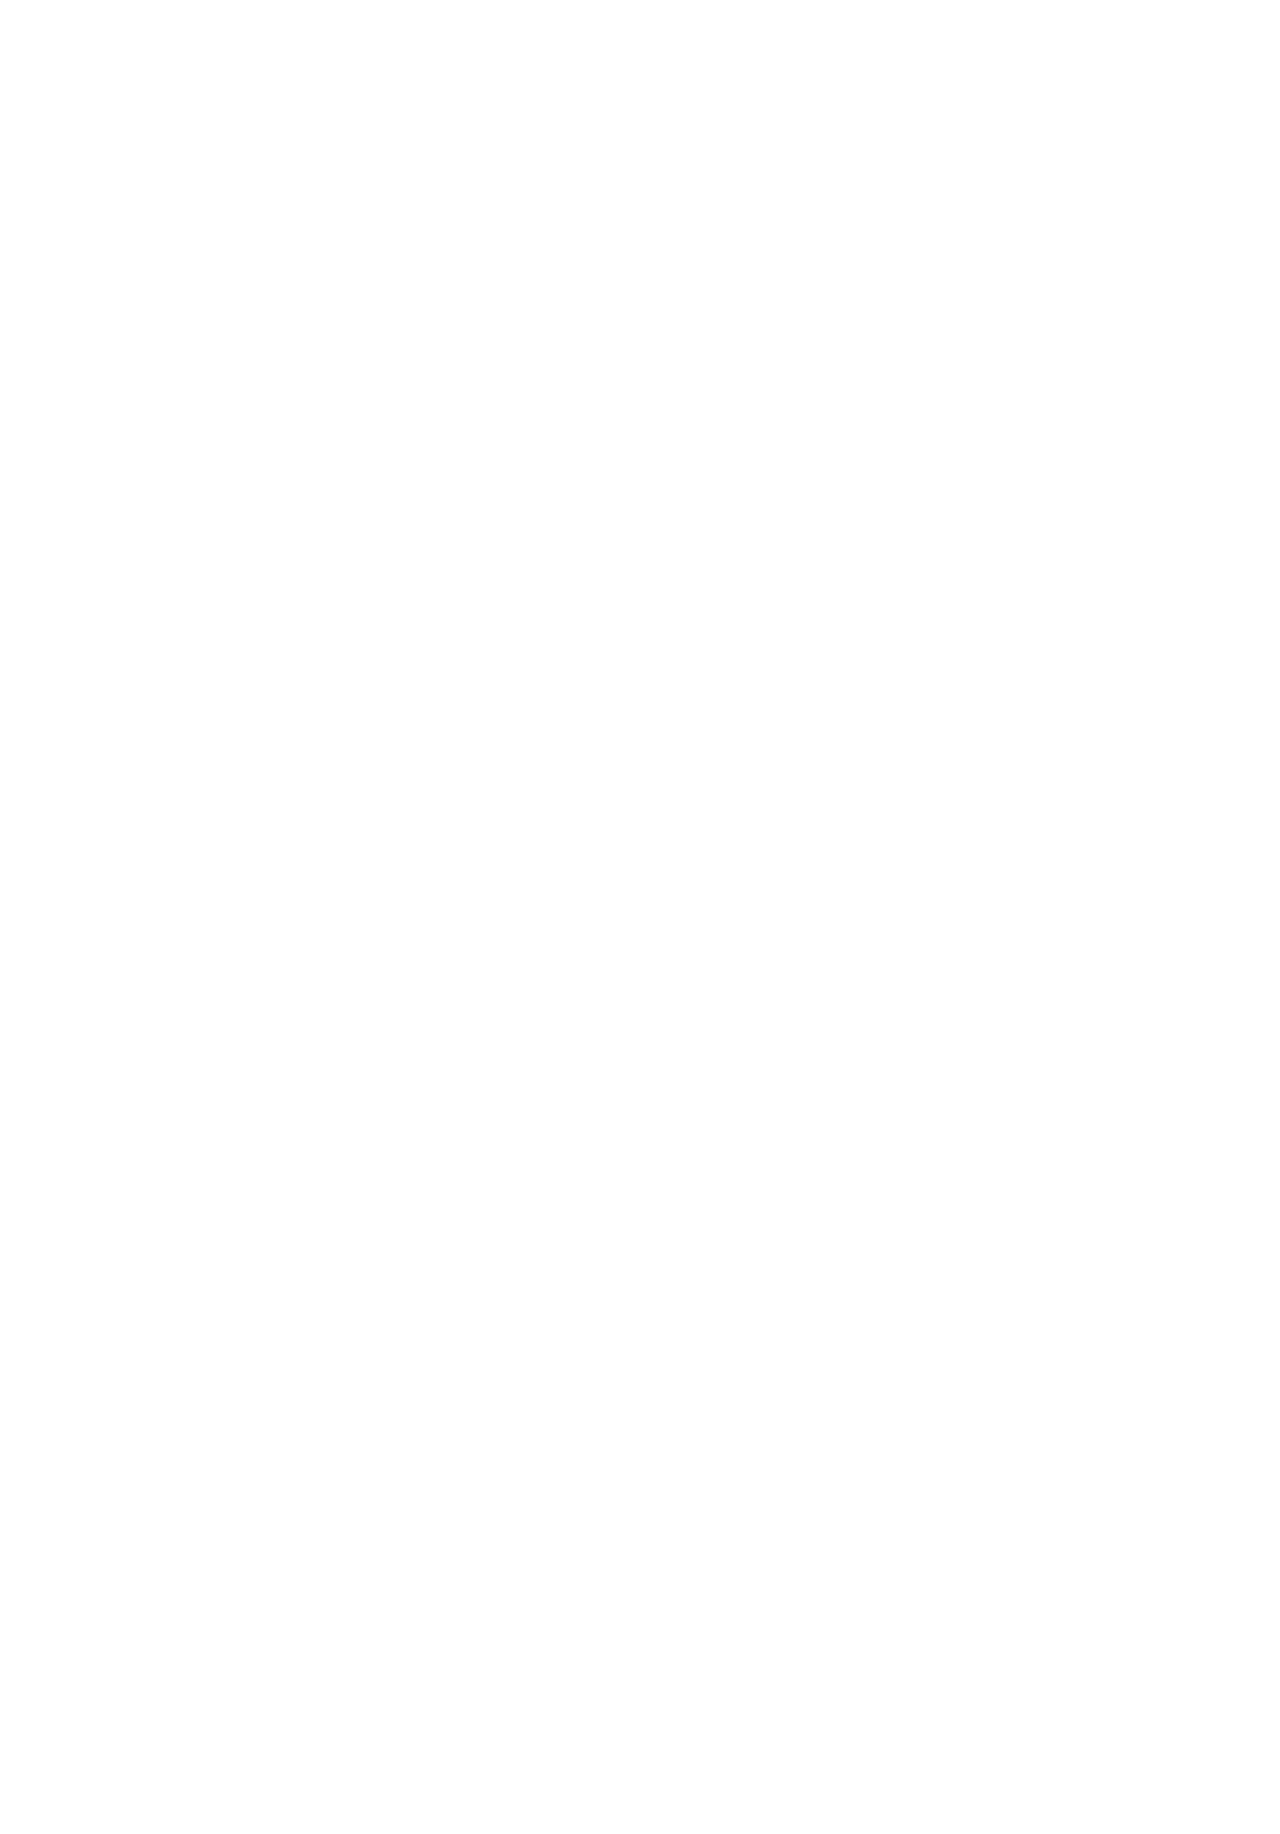 Saimin Seishidou 4: Ninshin Taiken Shidou 57